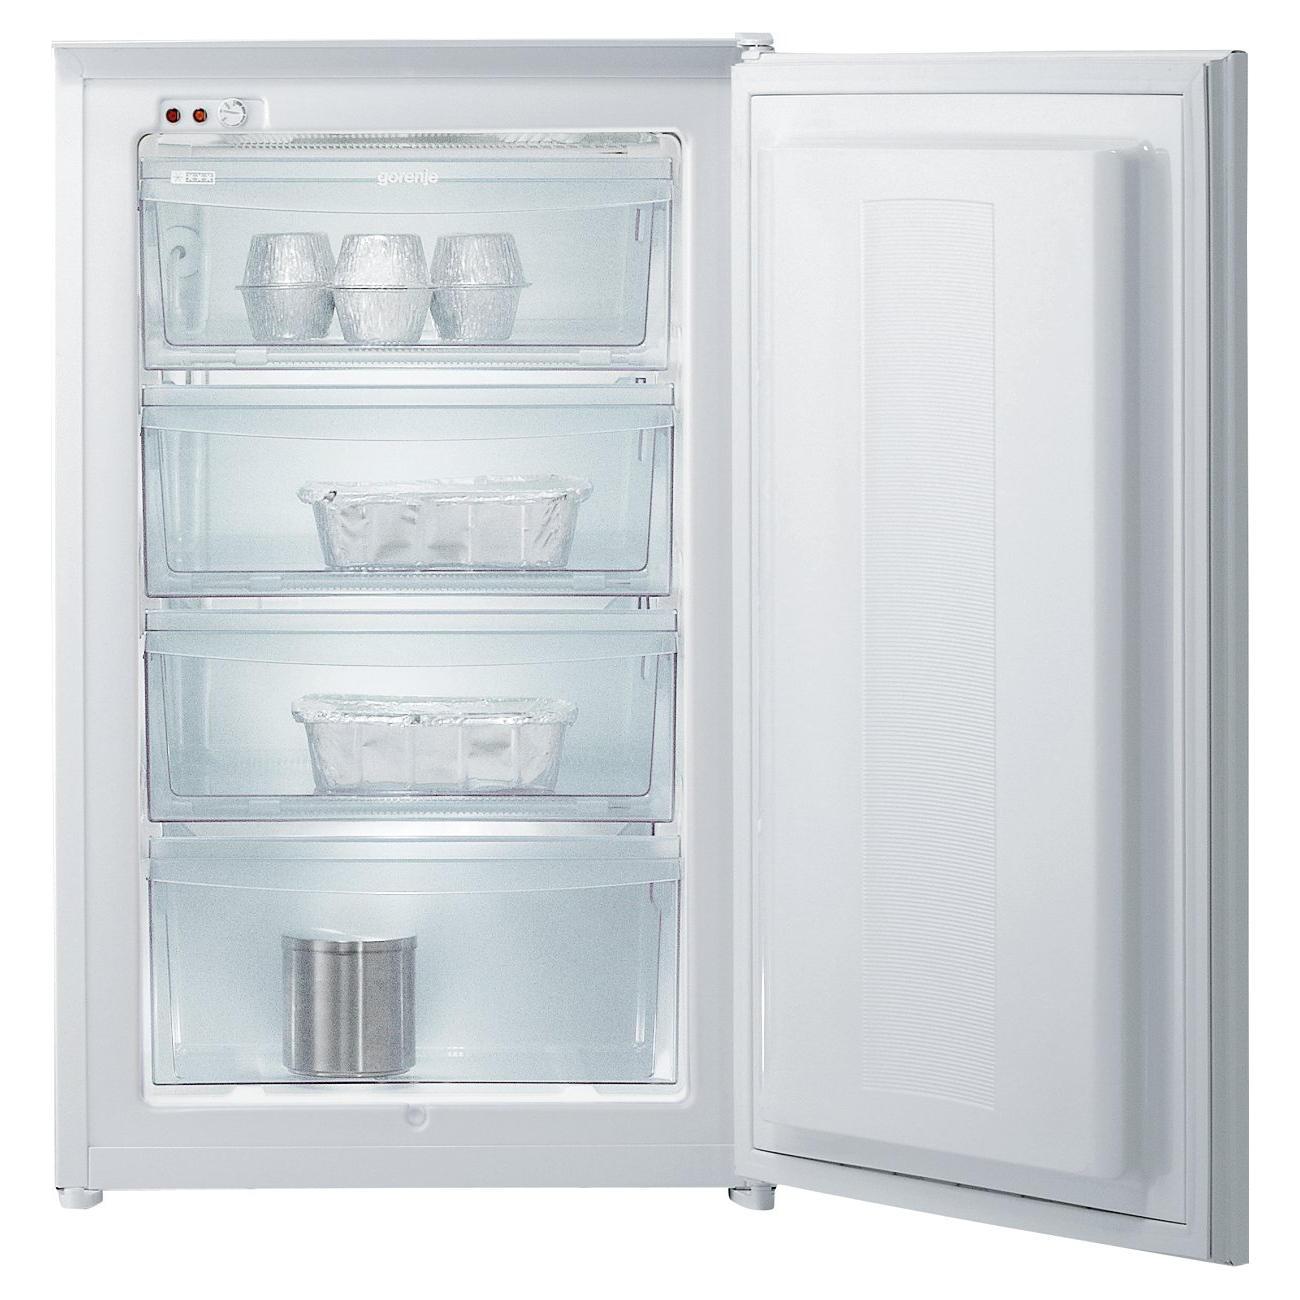 Gorenje FI4091AW Built In Integrated Freezer